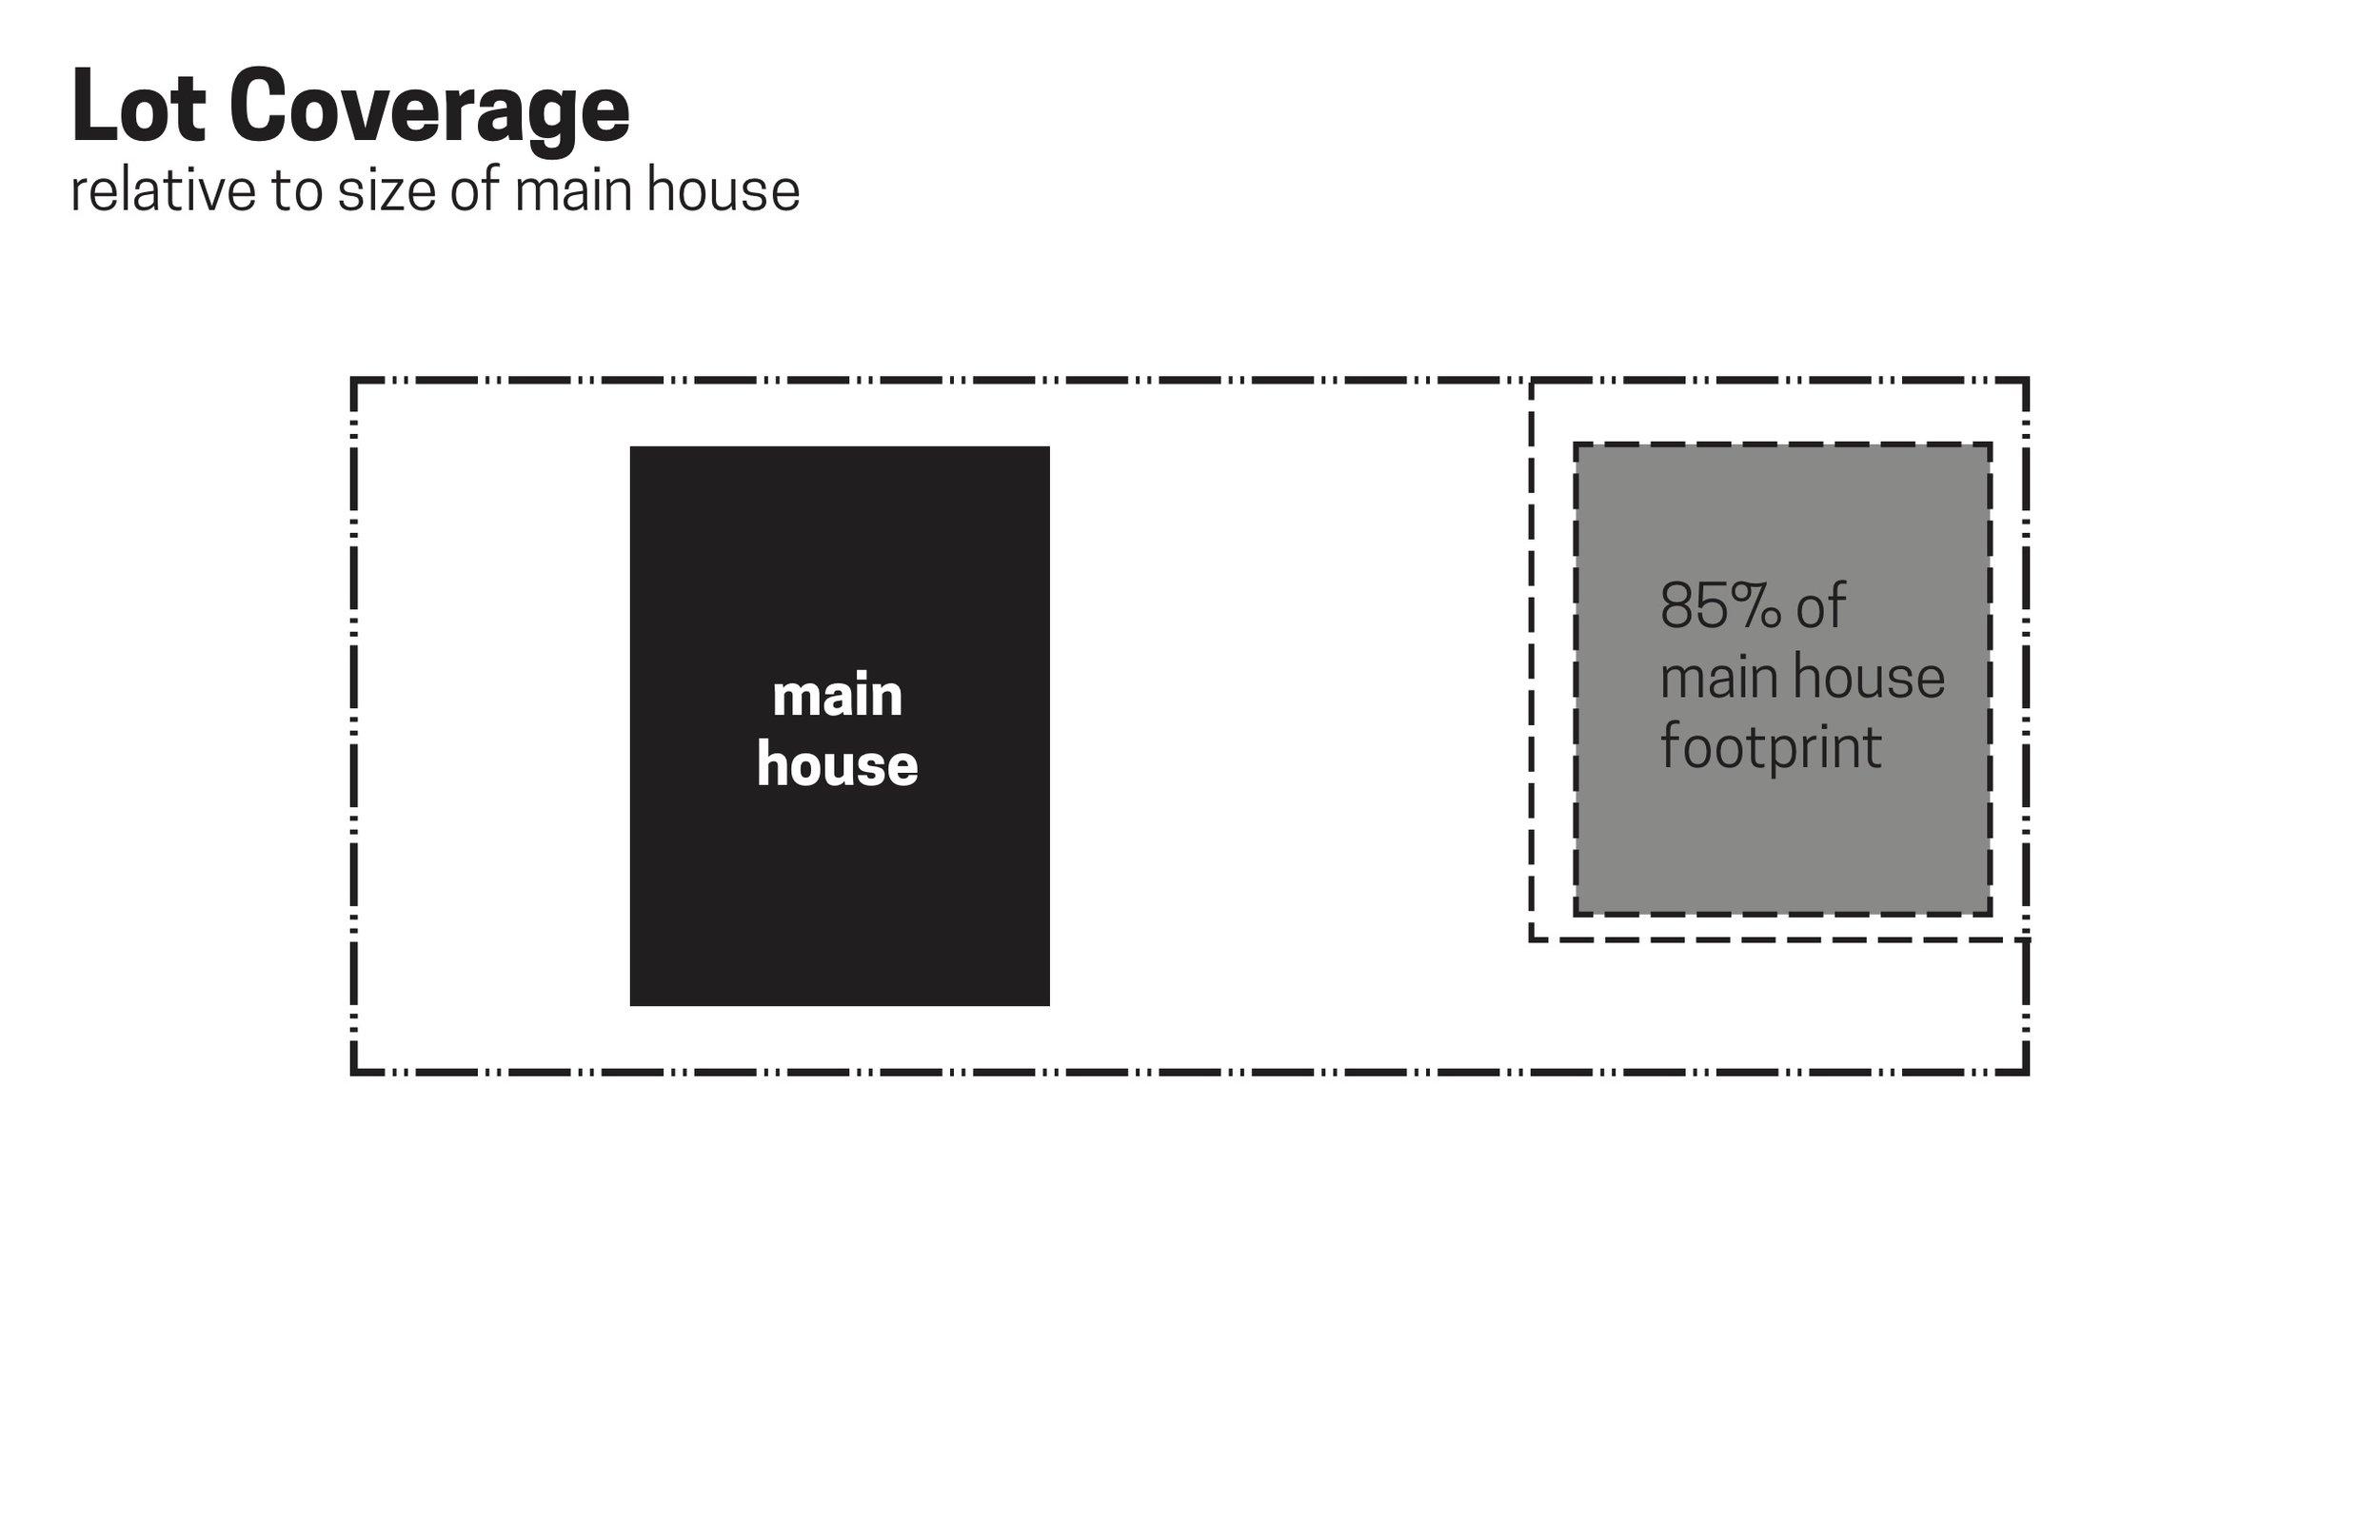 wc-studio-DADU-lot-coverage-relative-to-main-house.jpg